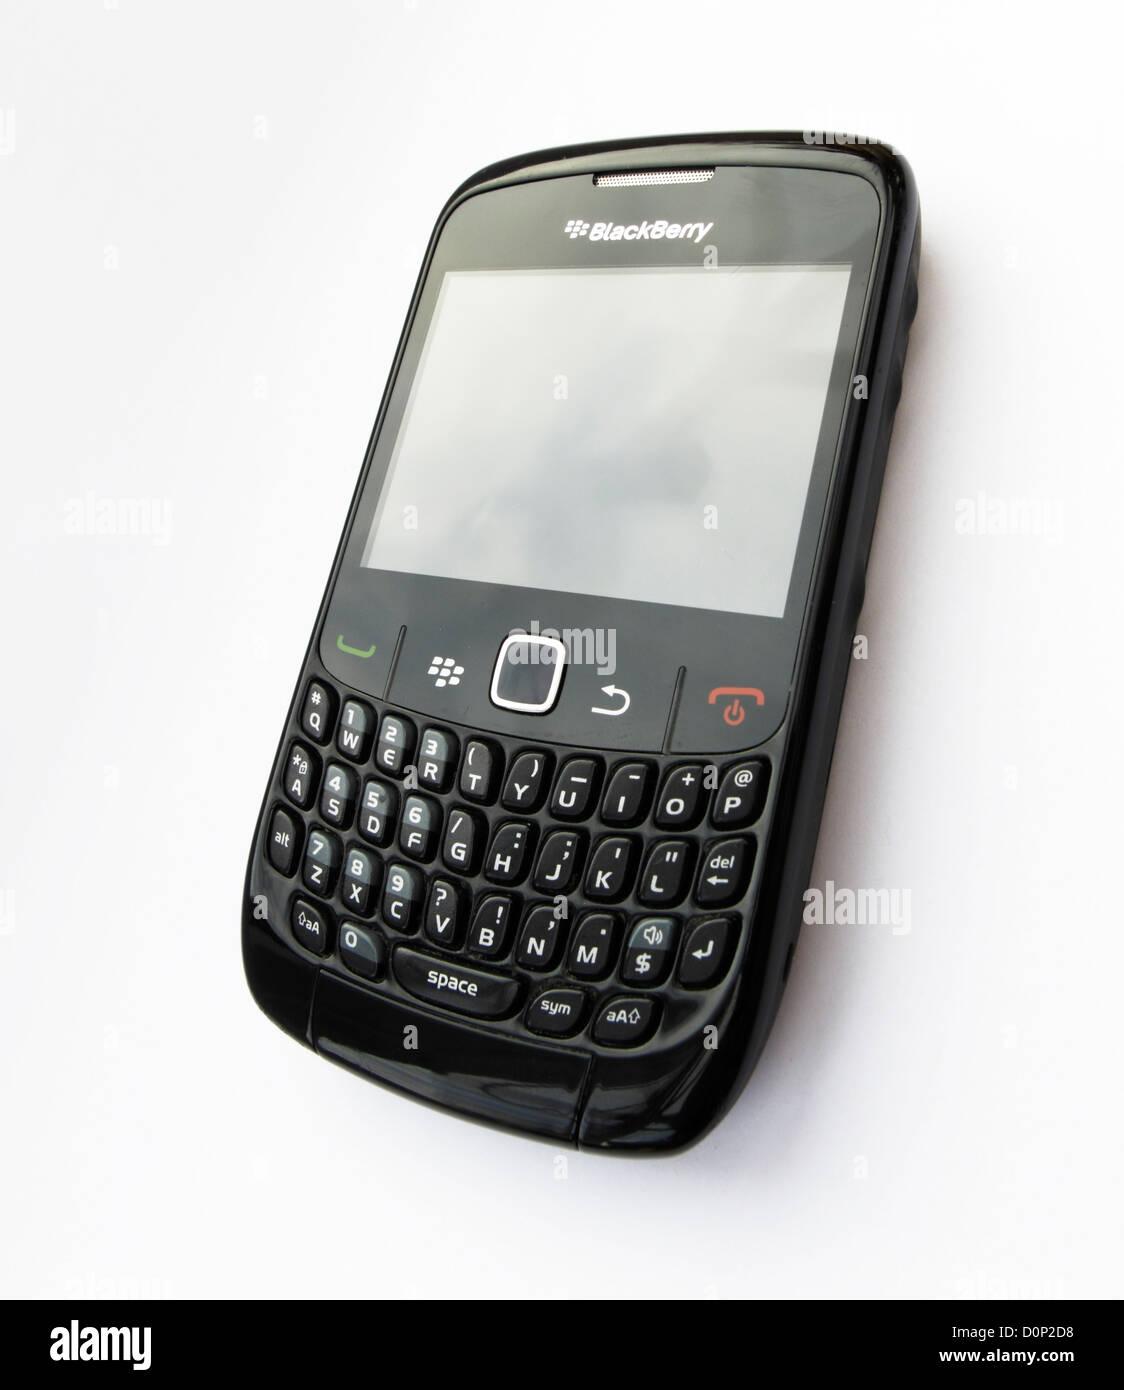 Qwerty Keyboard Phone Stock Photos & Qwerty Keyboard Phone